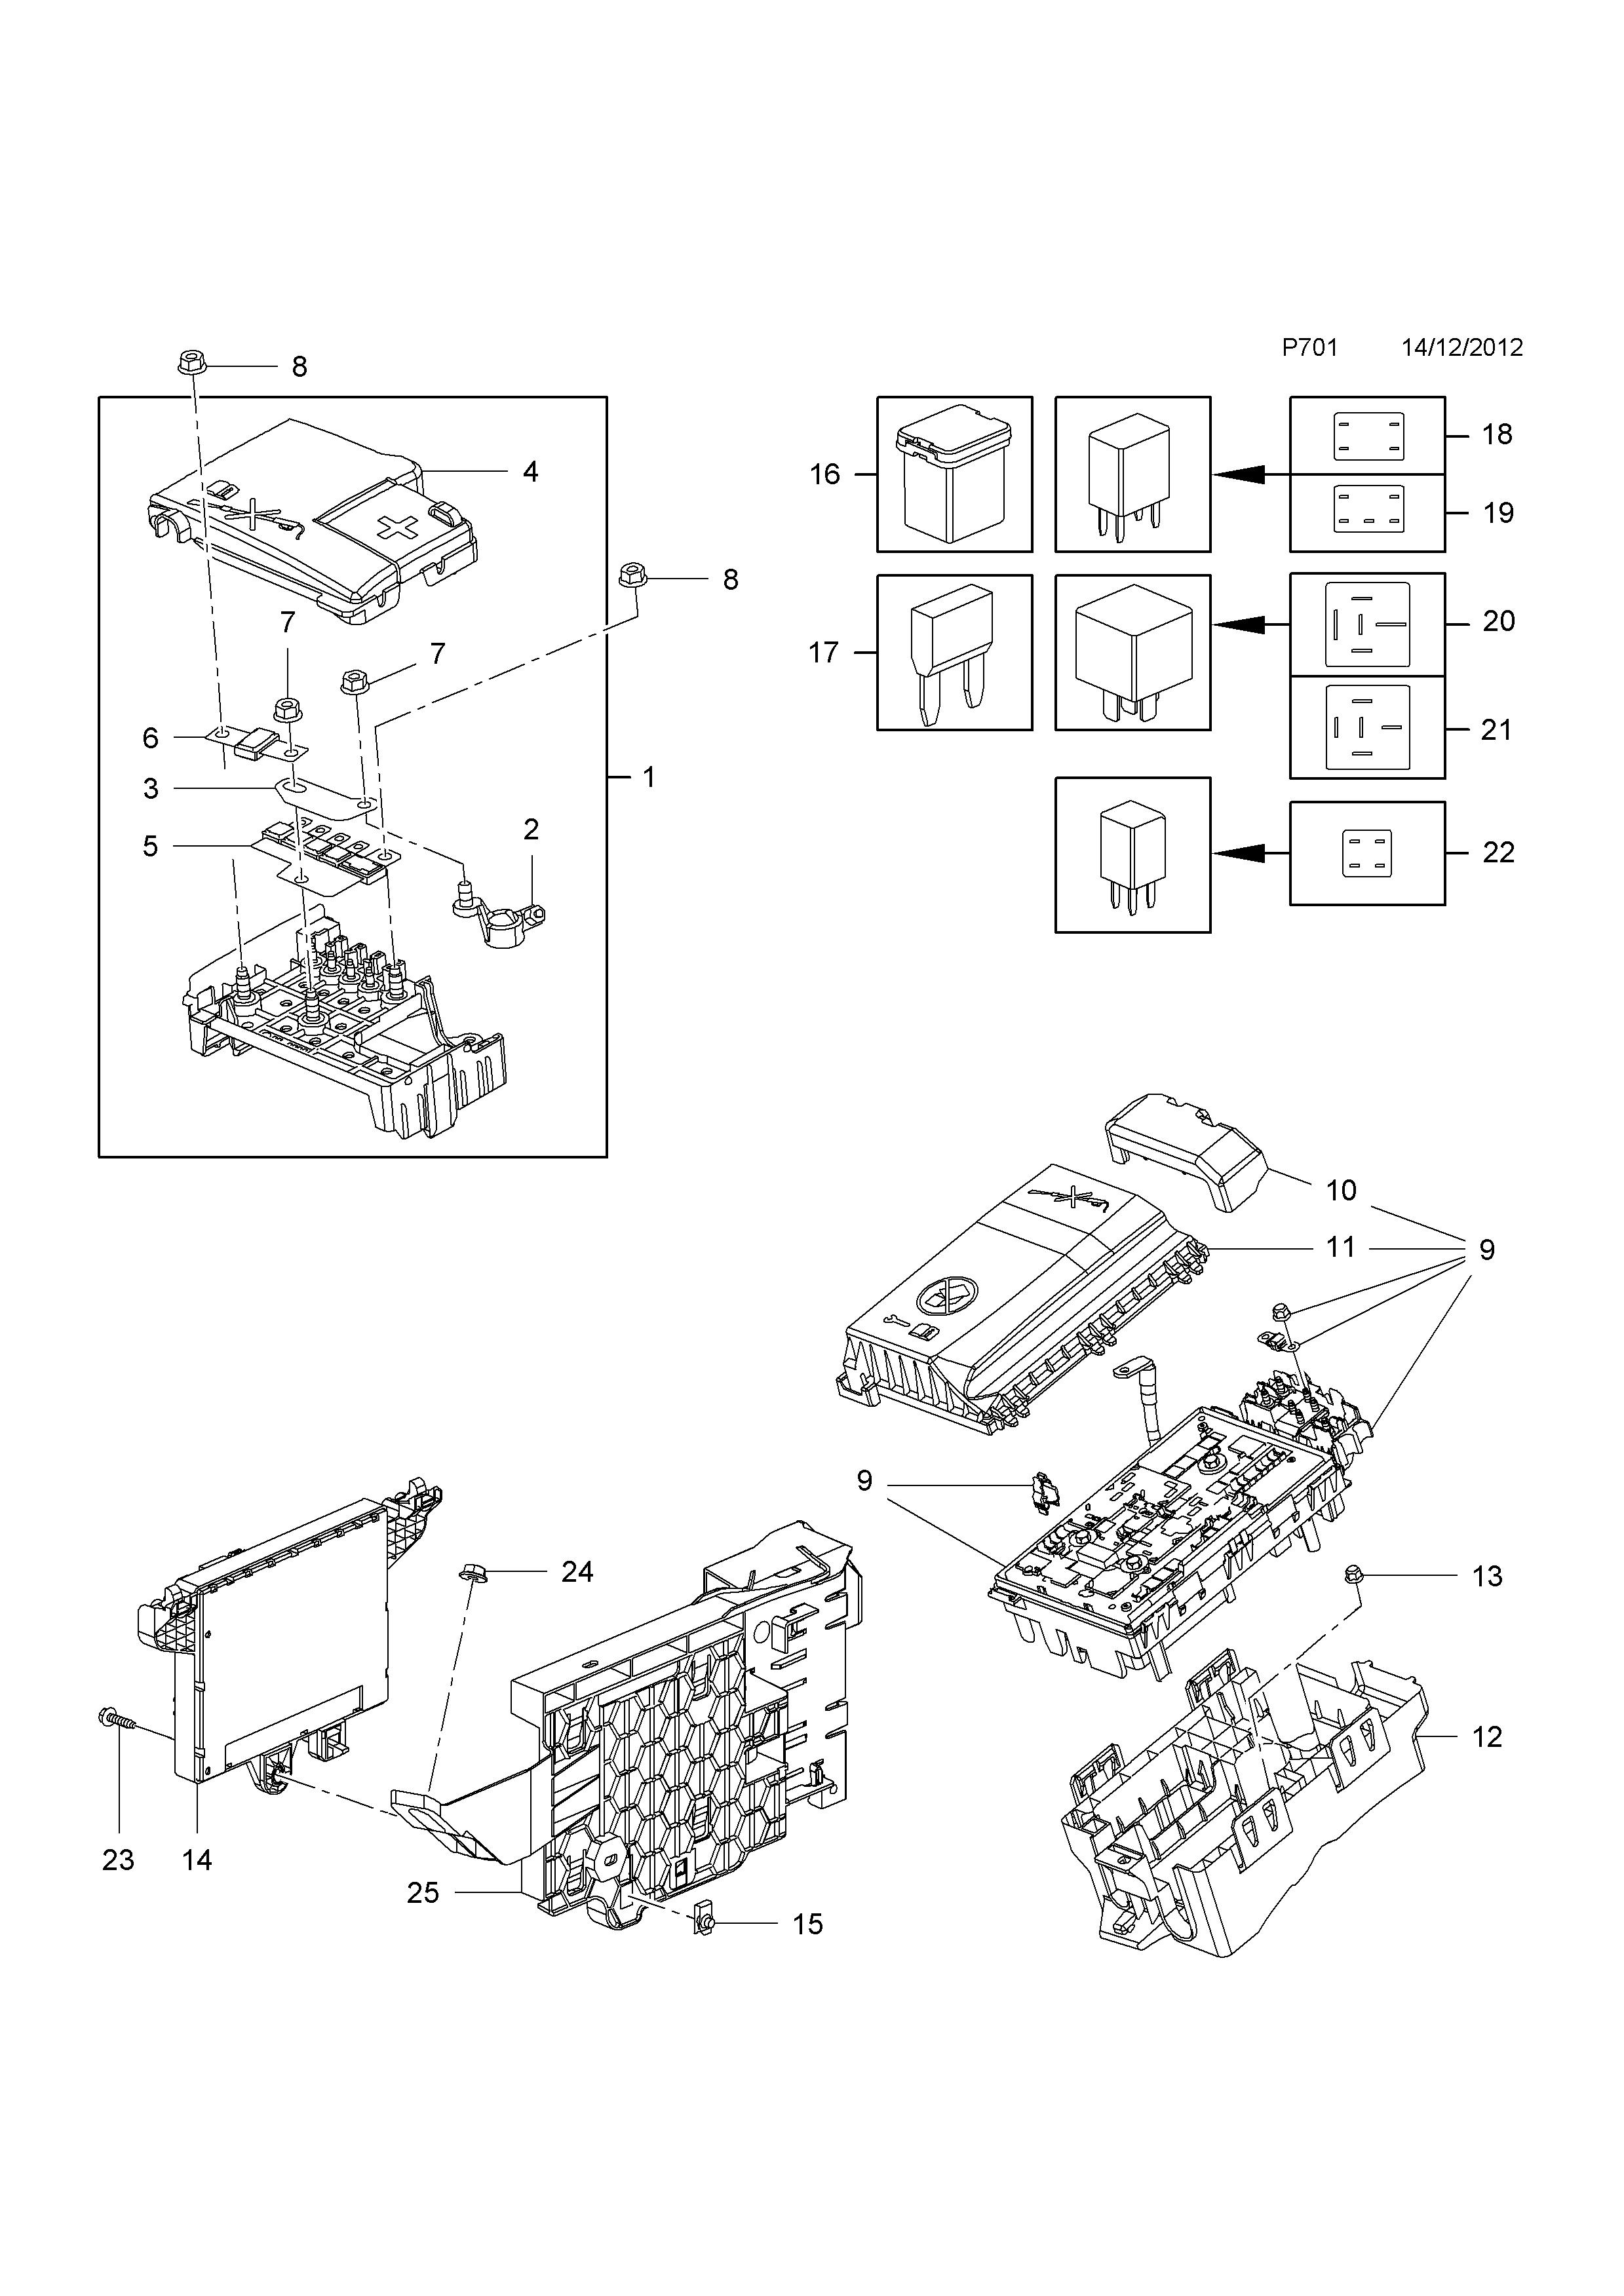 Epc Fuse Box Wiring Diagram Skoda Pickup Schematics Diagramvauxhall Cascada Fuses U003e Opel Online